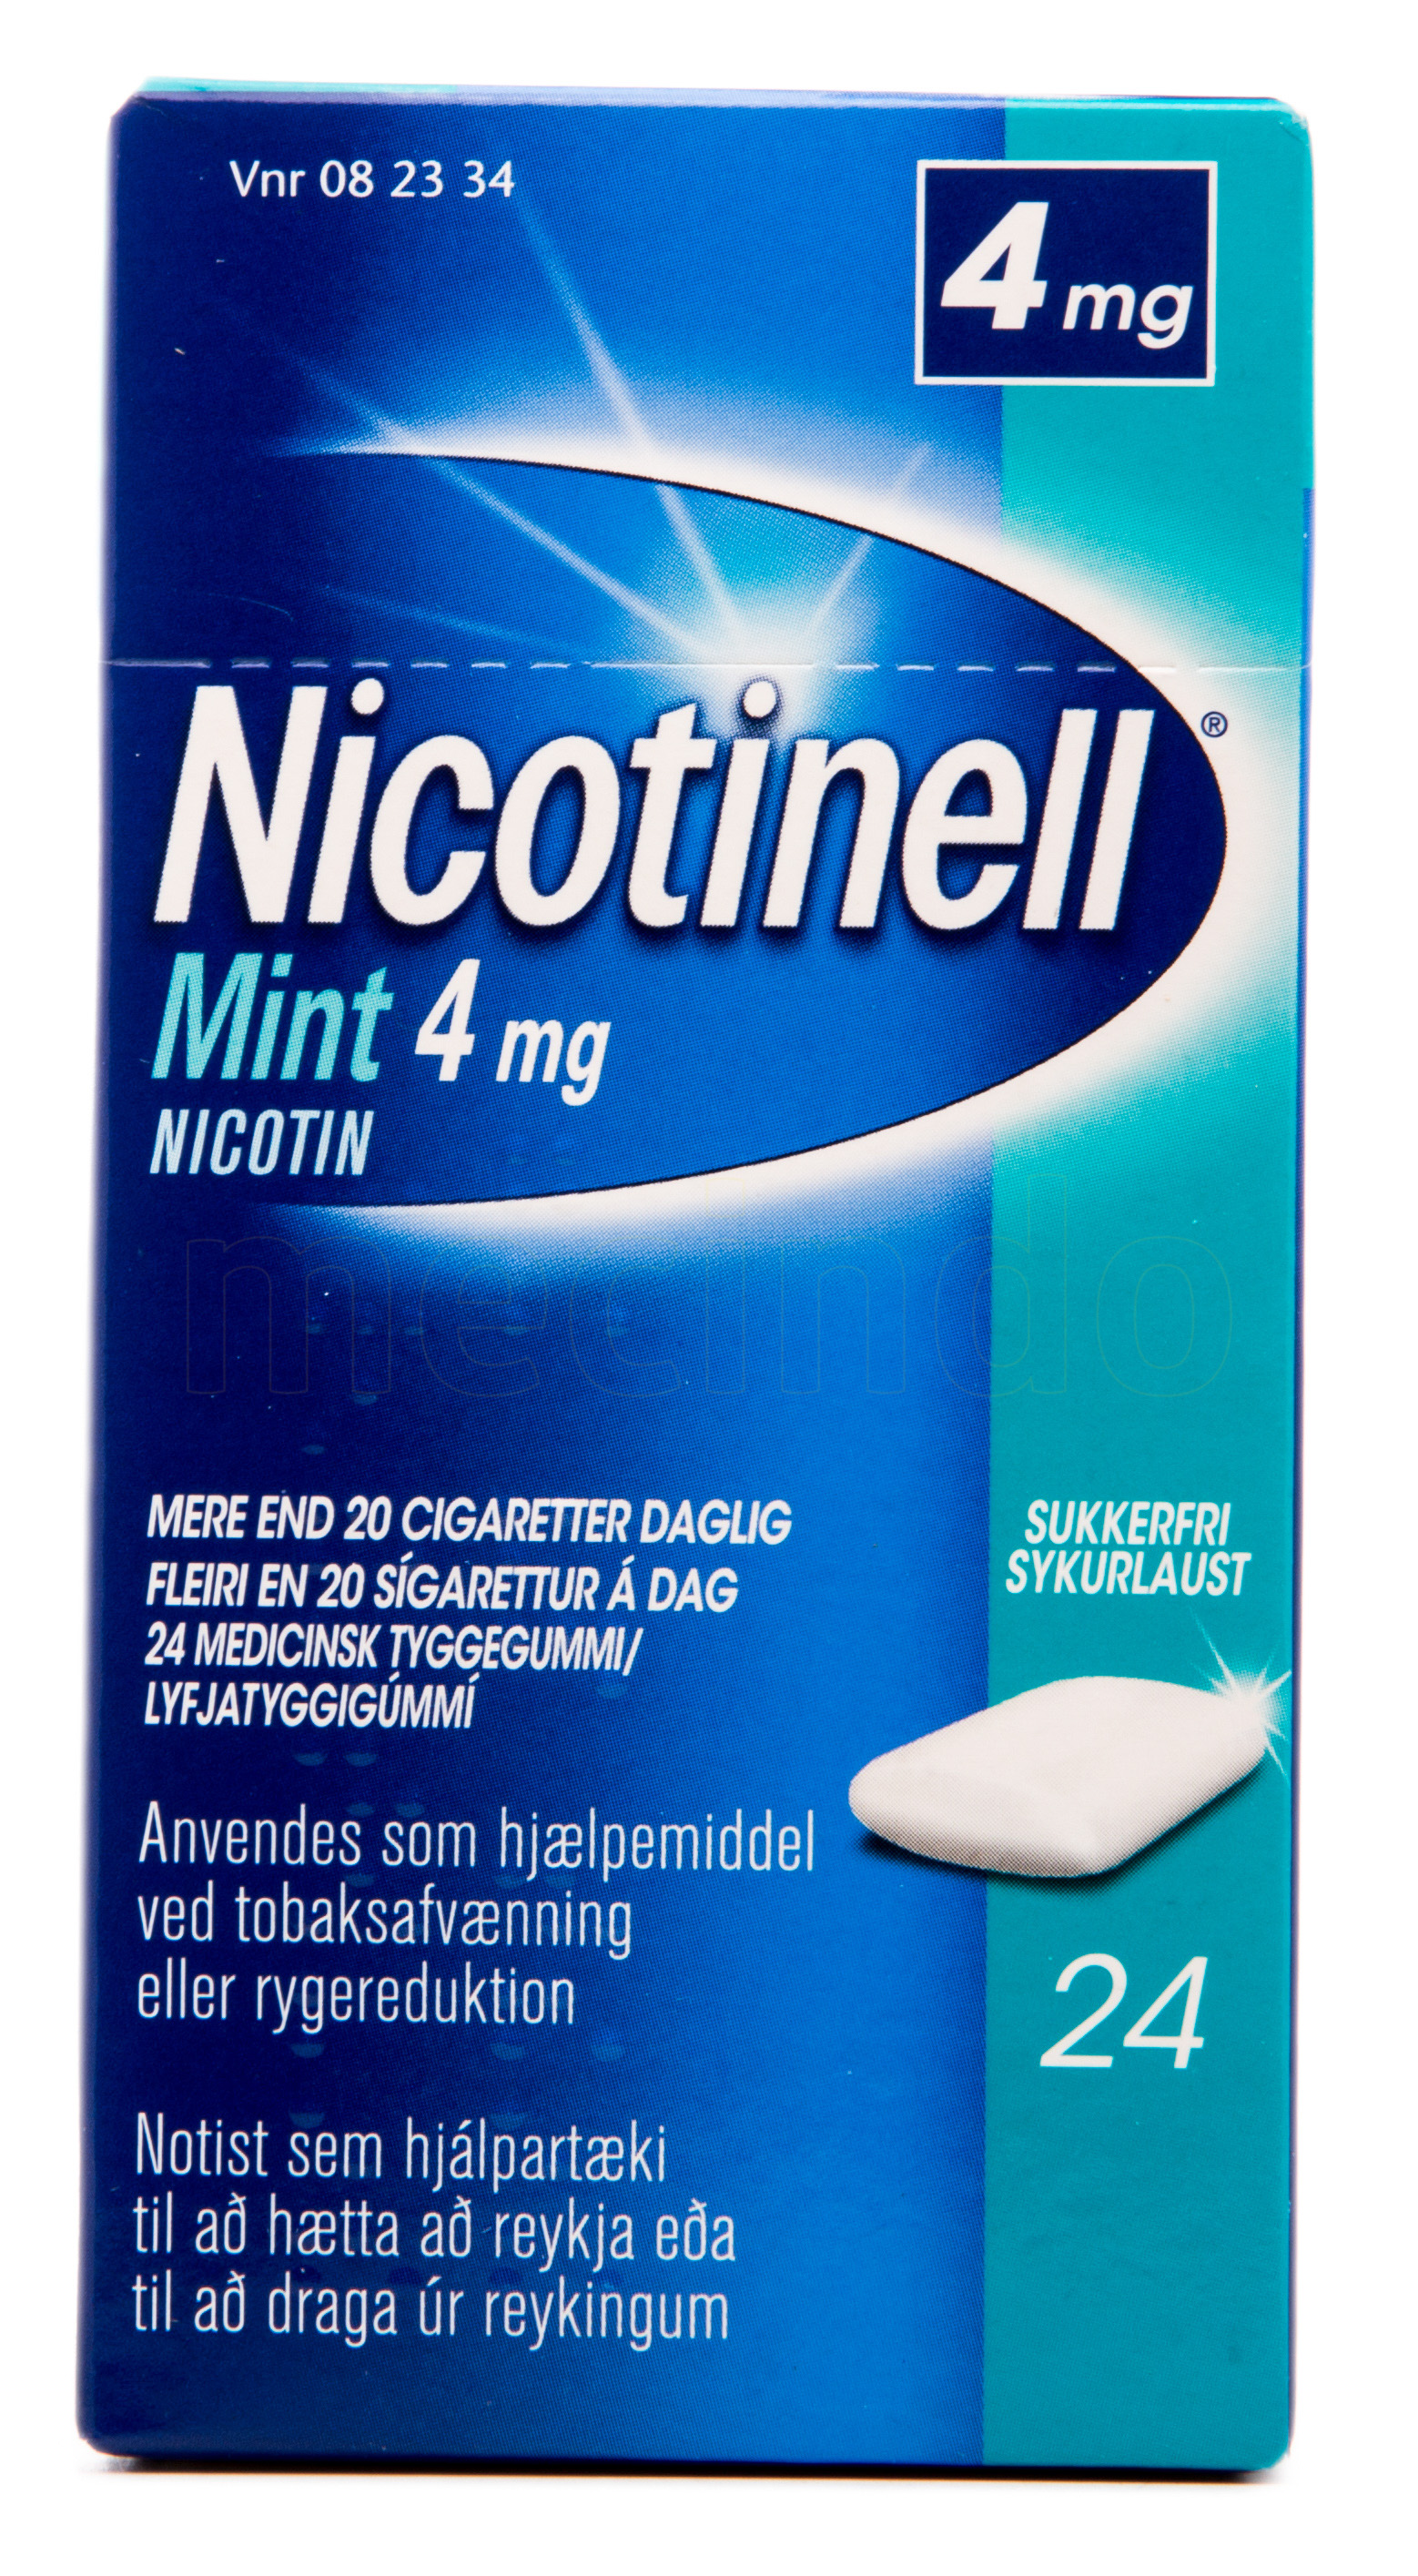 Billede af Nicotinell Tyggegummi Mint - 4 mg - 24 stk